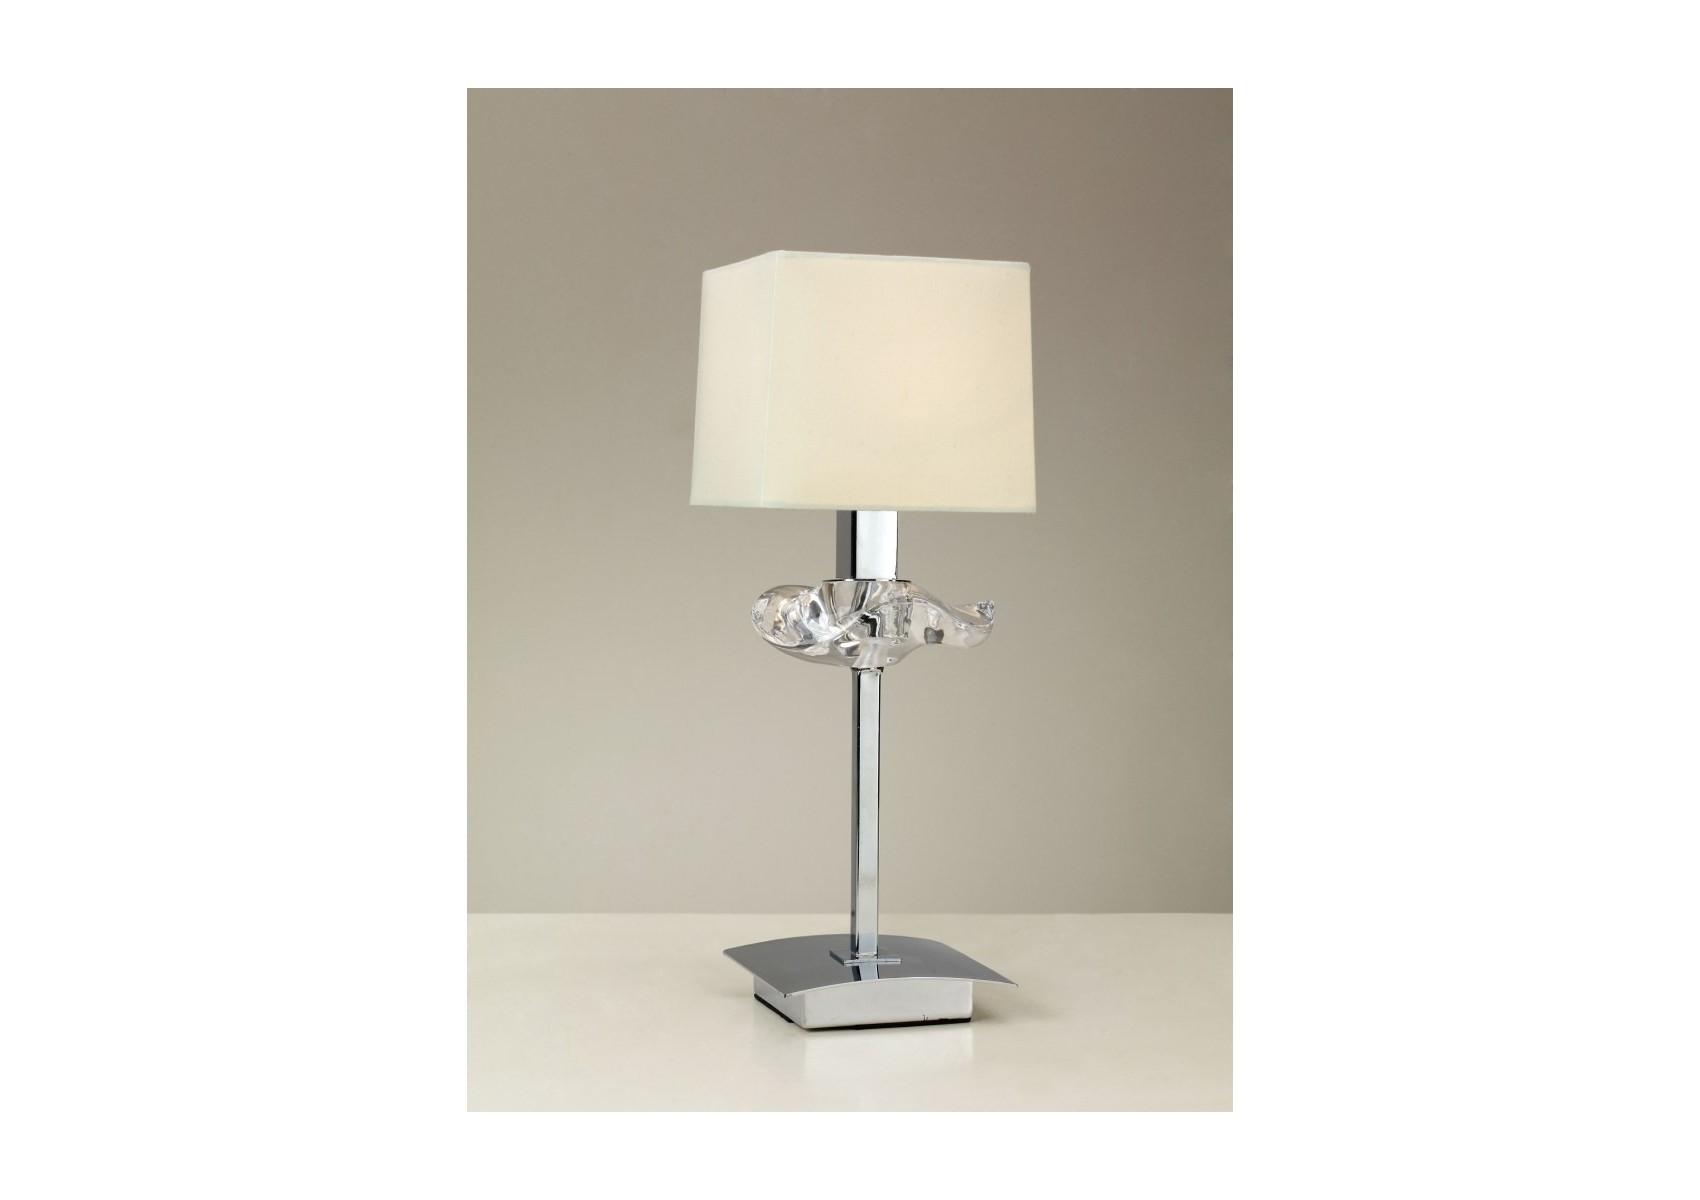 Design Chrome À Lampe Poser 1l Boite Mantra Akira jMVUSzGpqL